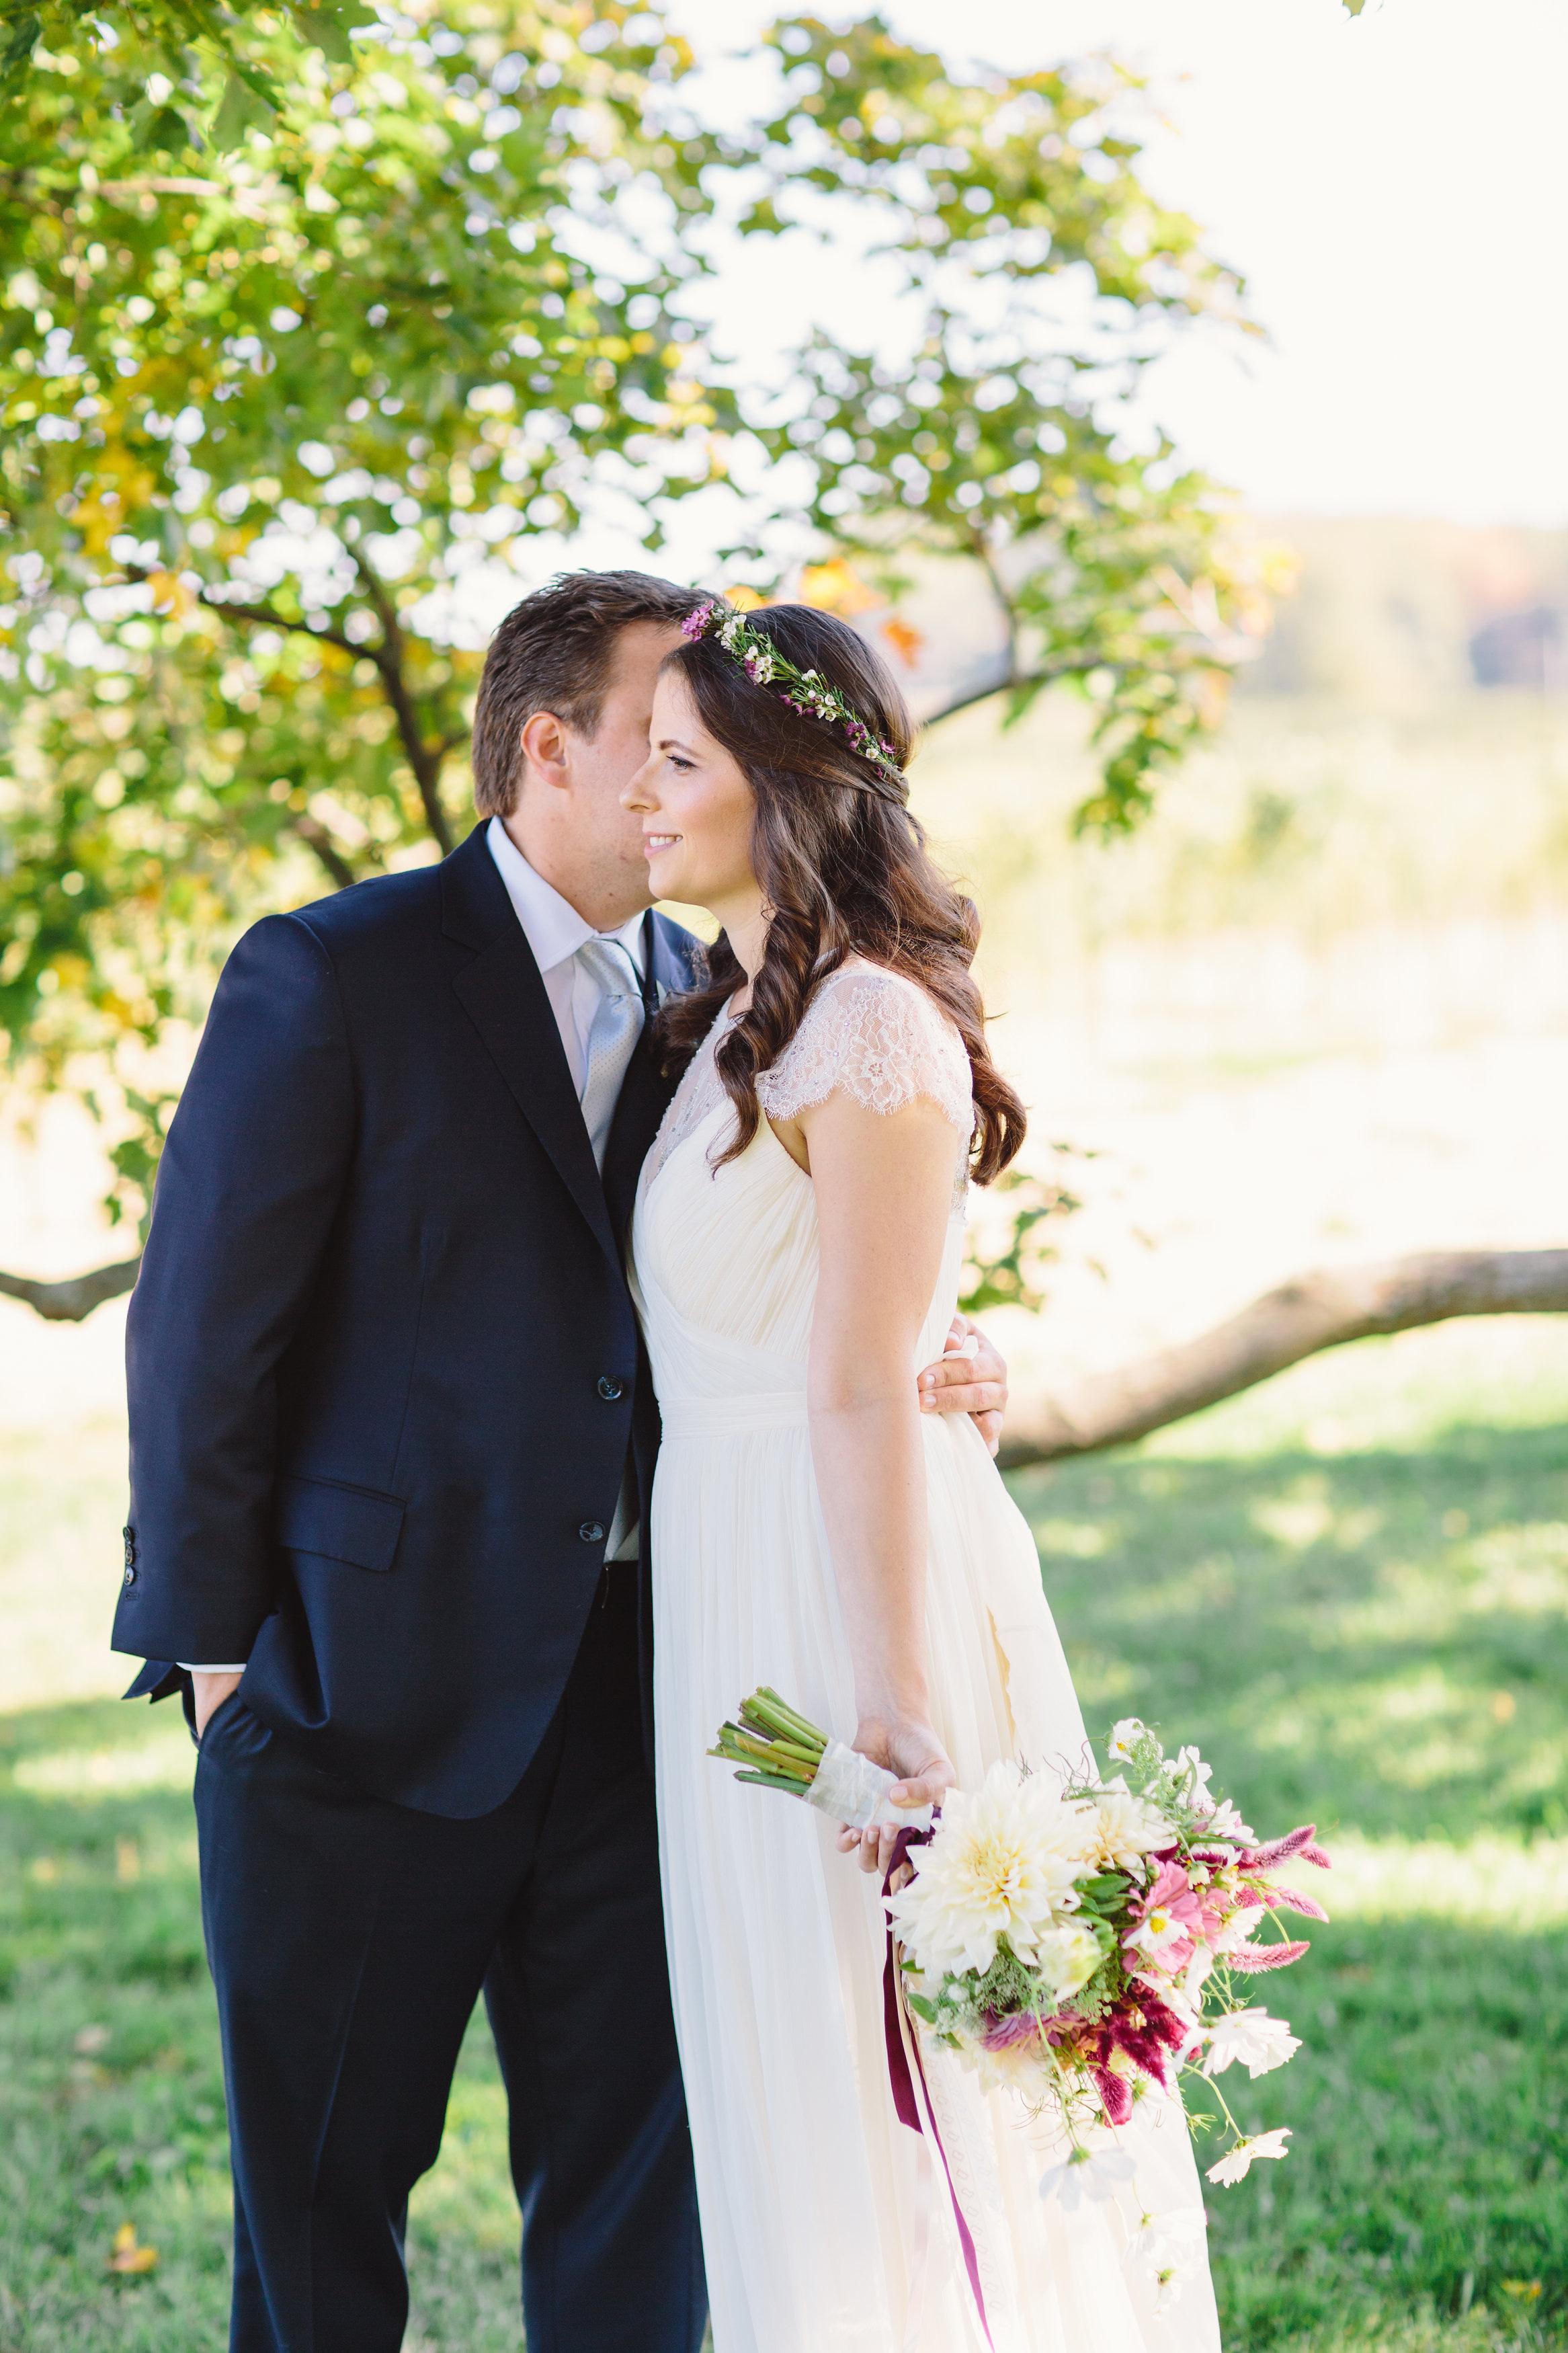 marial-daniel-wedding-balls-falls-sara-wilde-photography-0299.jpg